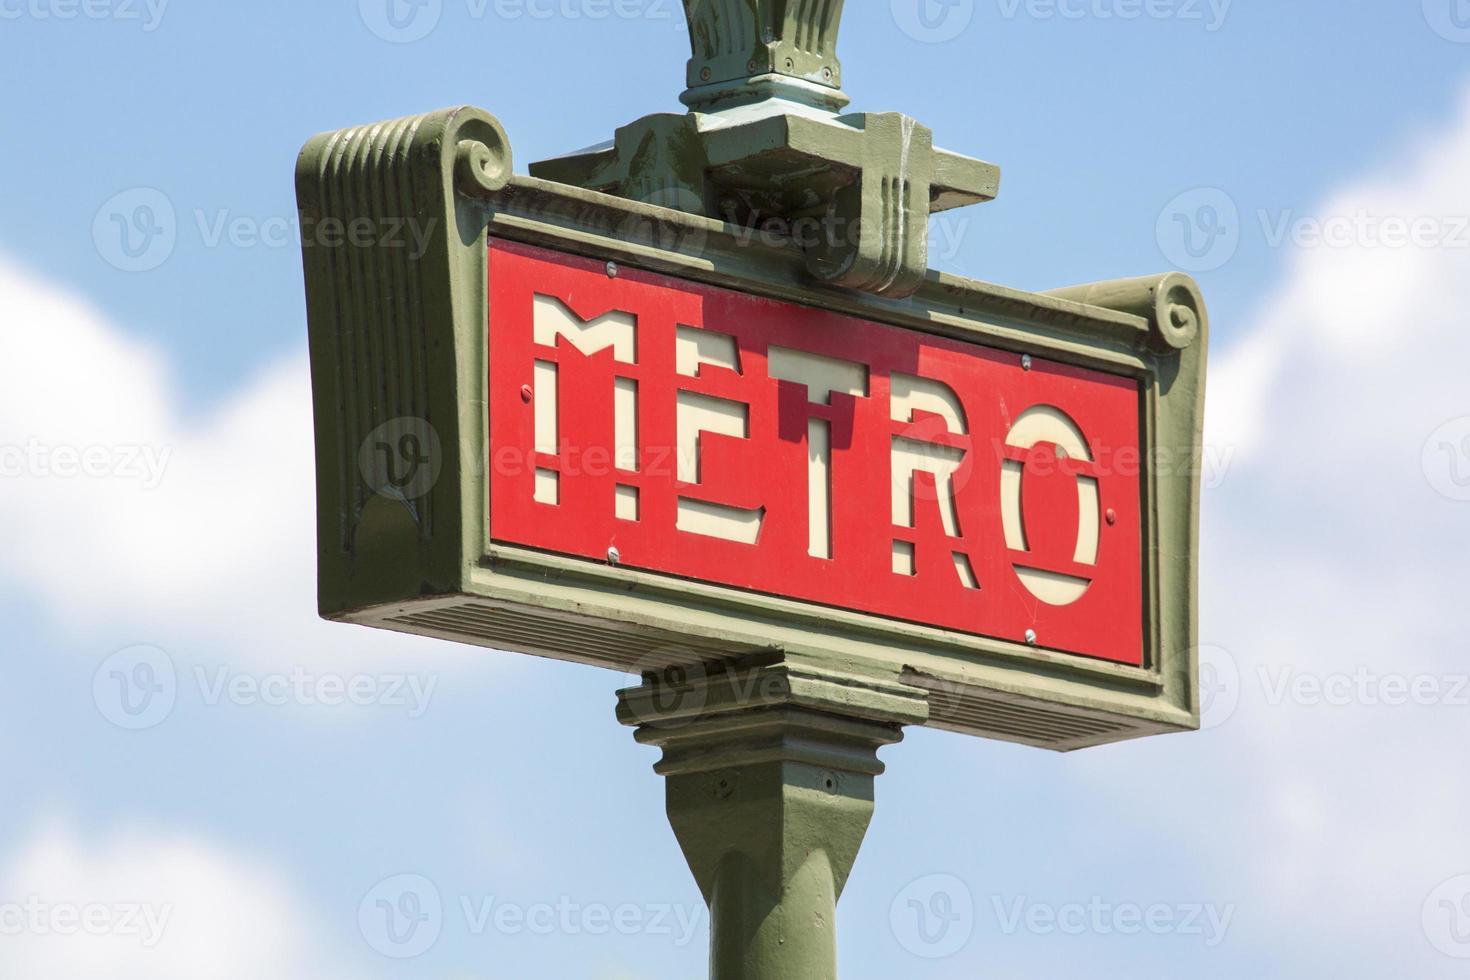 Vintage Paris Metro Sign with cloudy sky photo